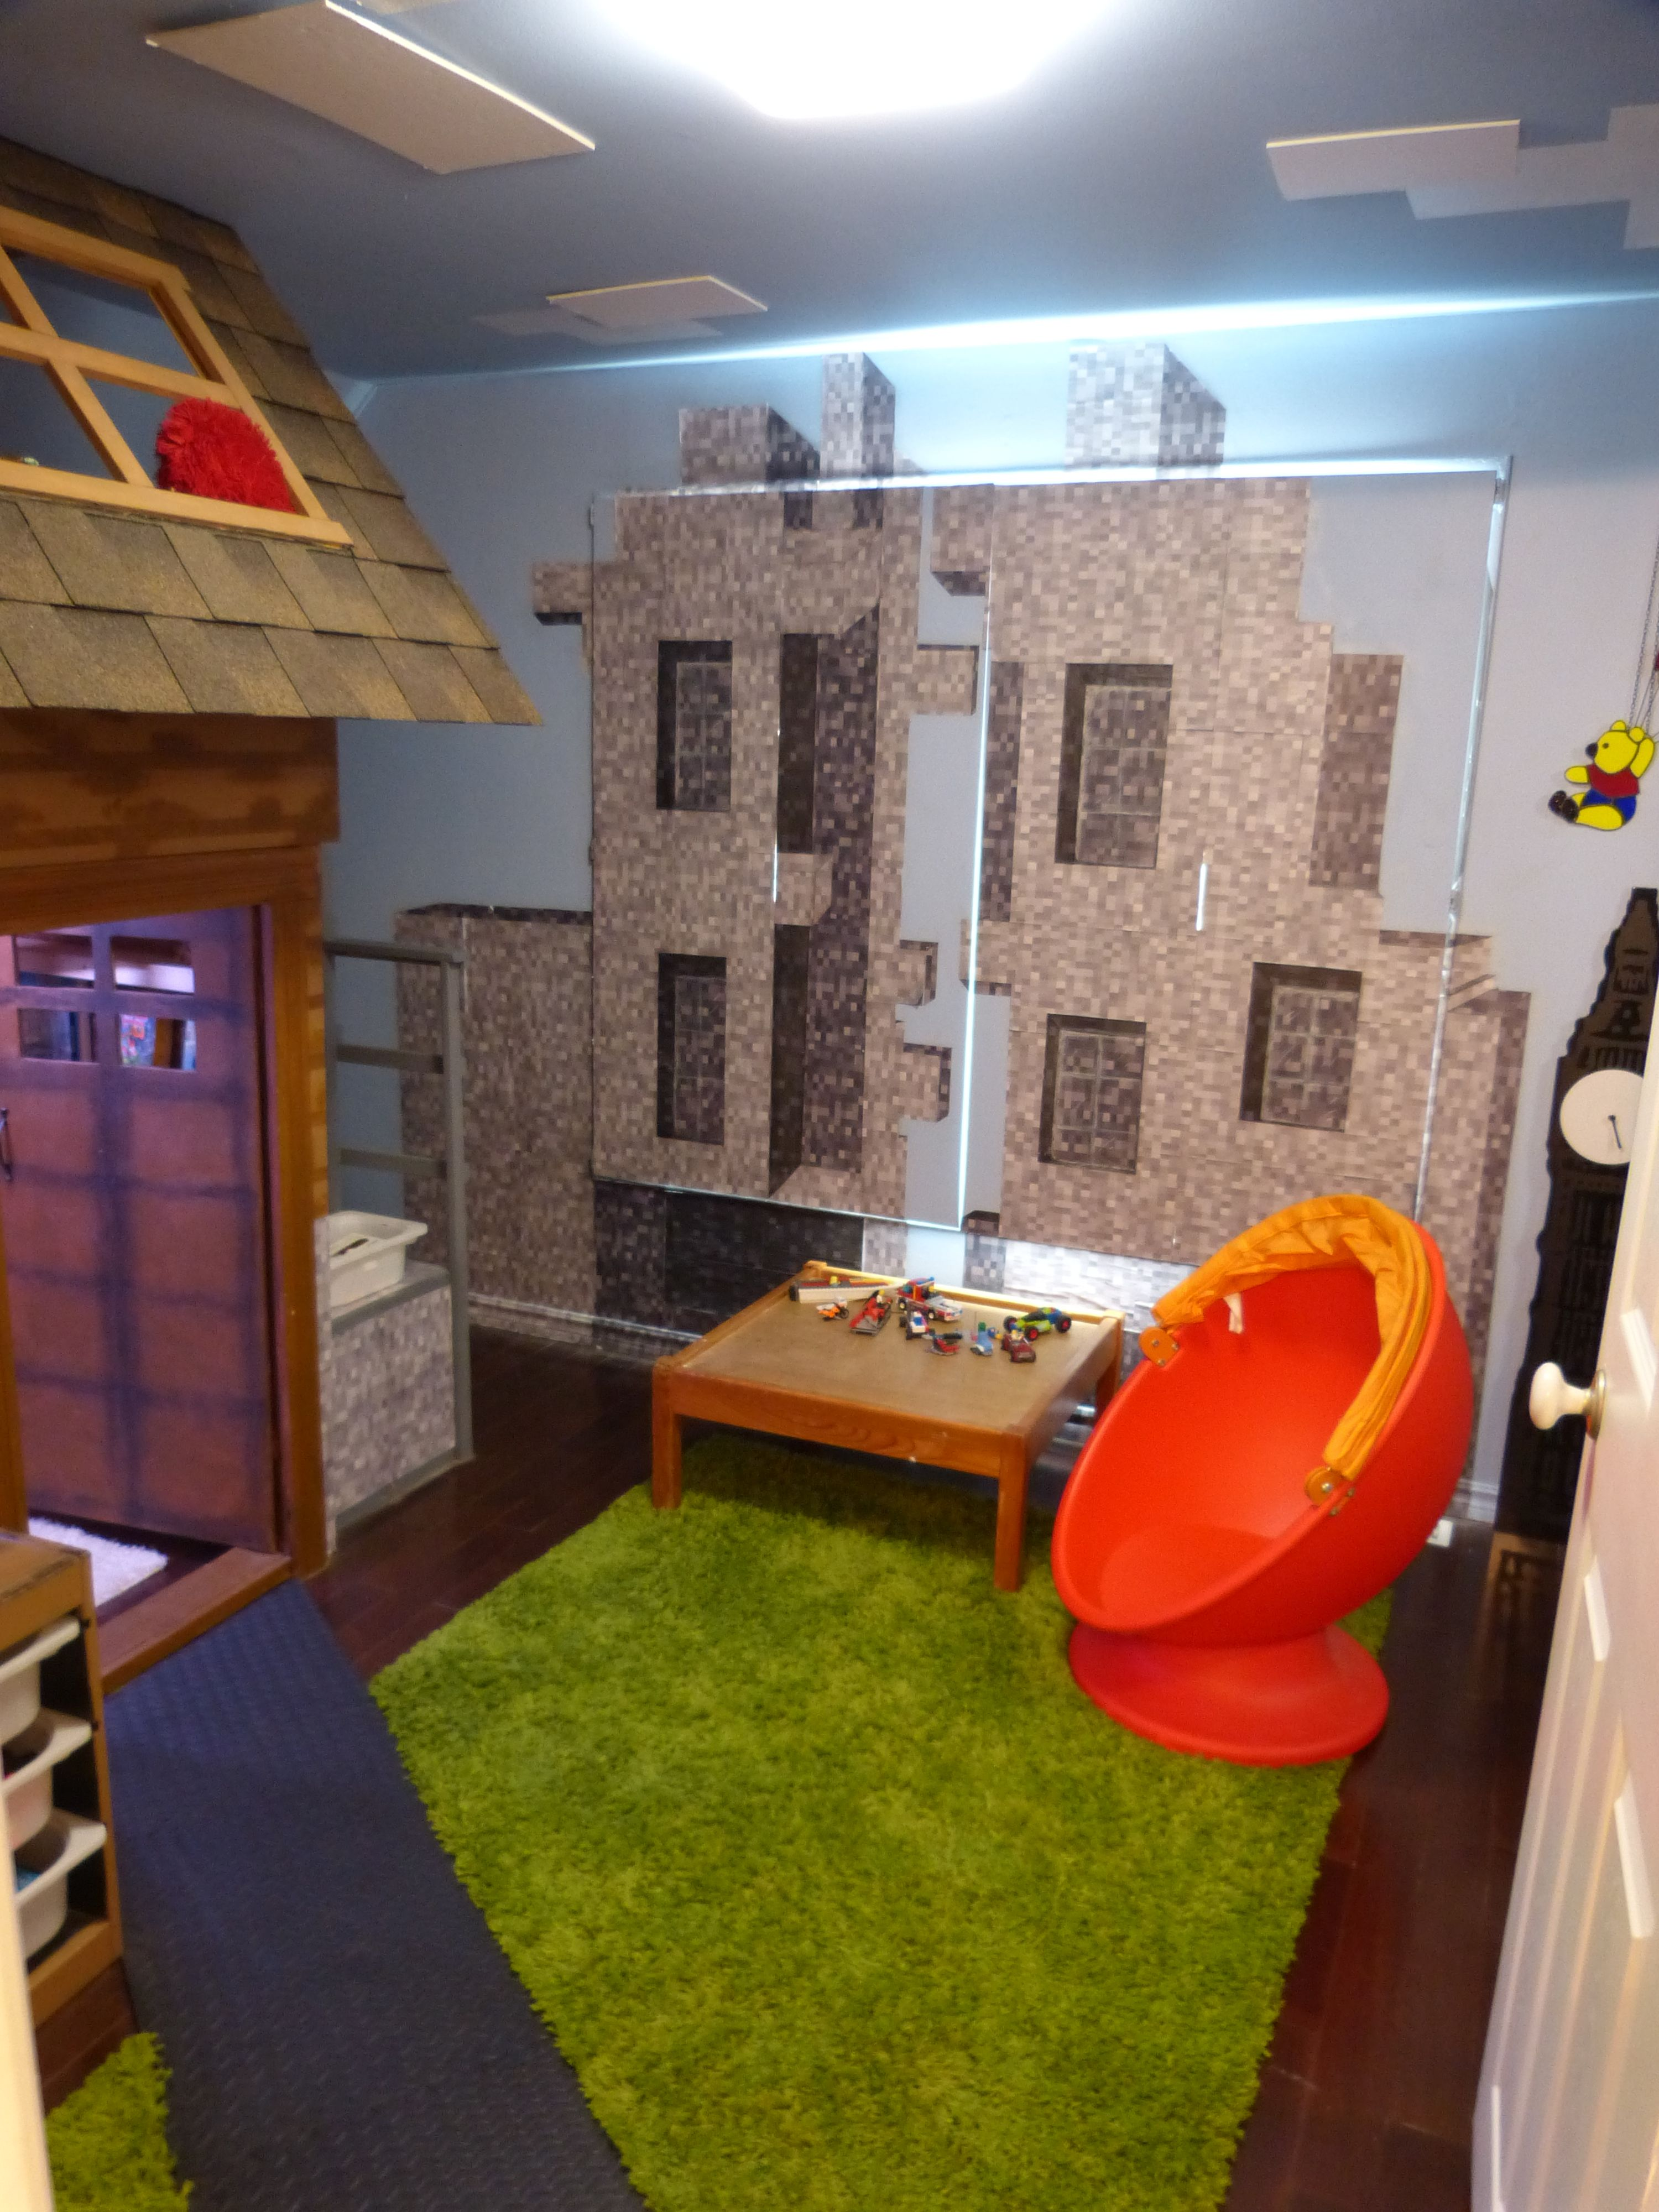 Bedroom Created To Look Like The Minecraft Village Created